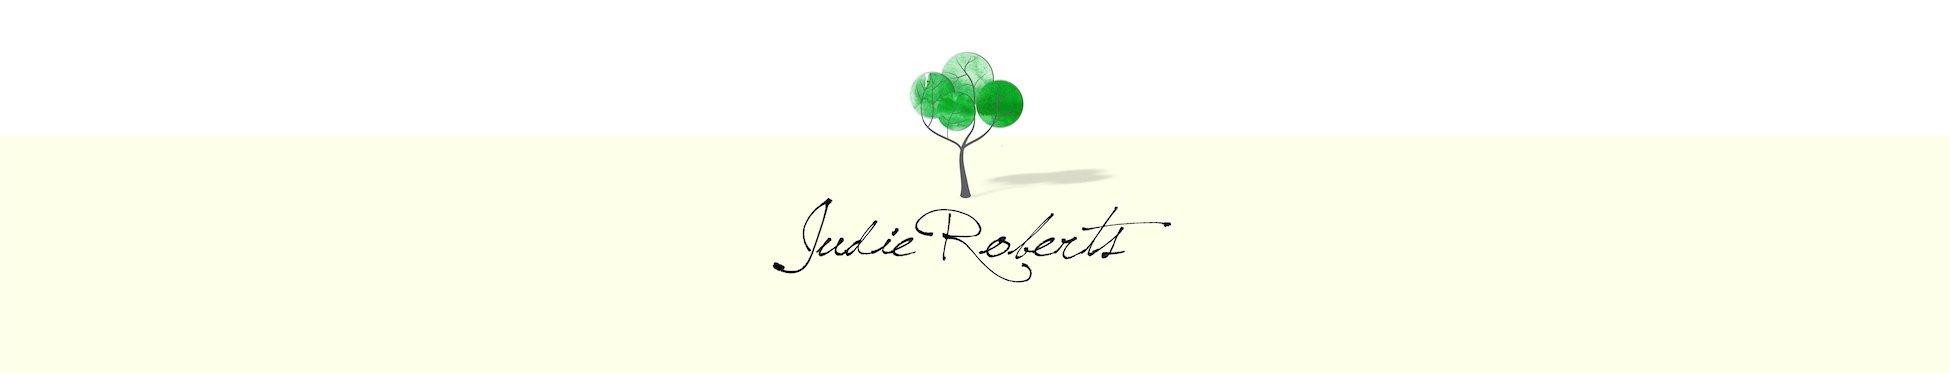 Judie Roberts Psychic